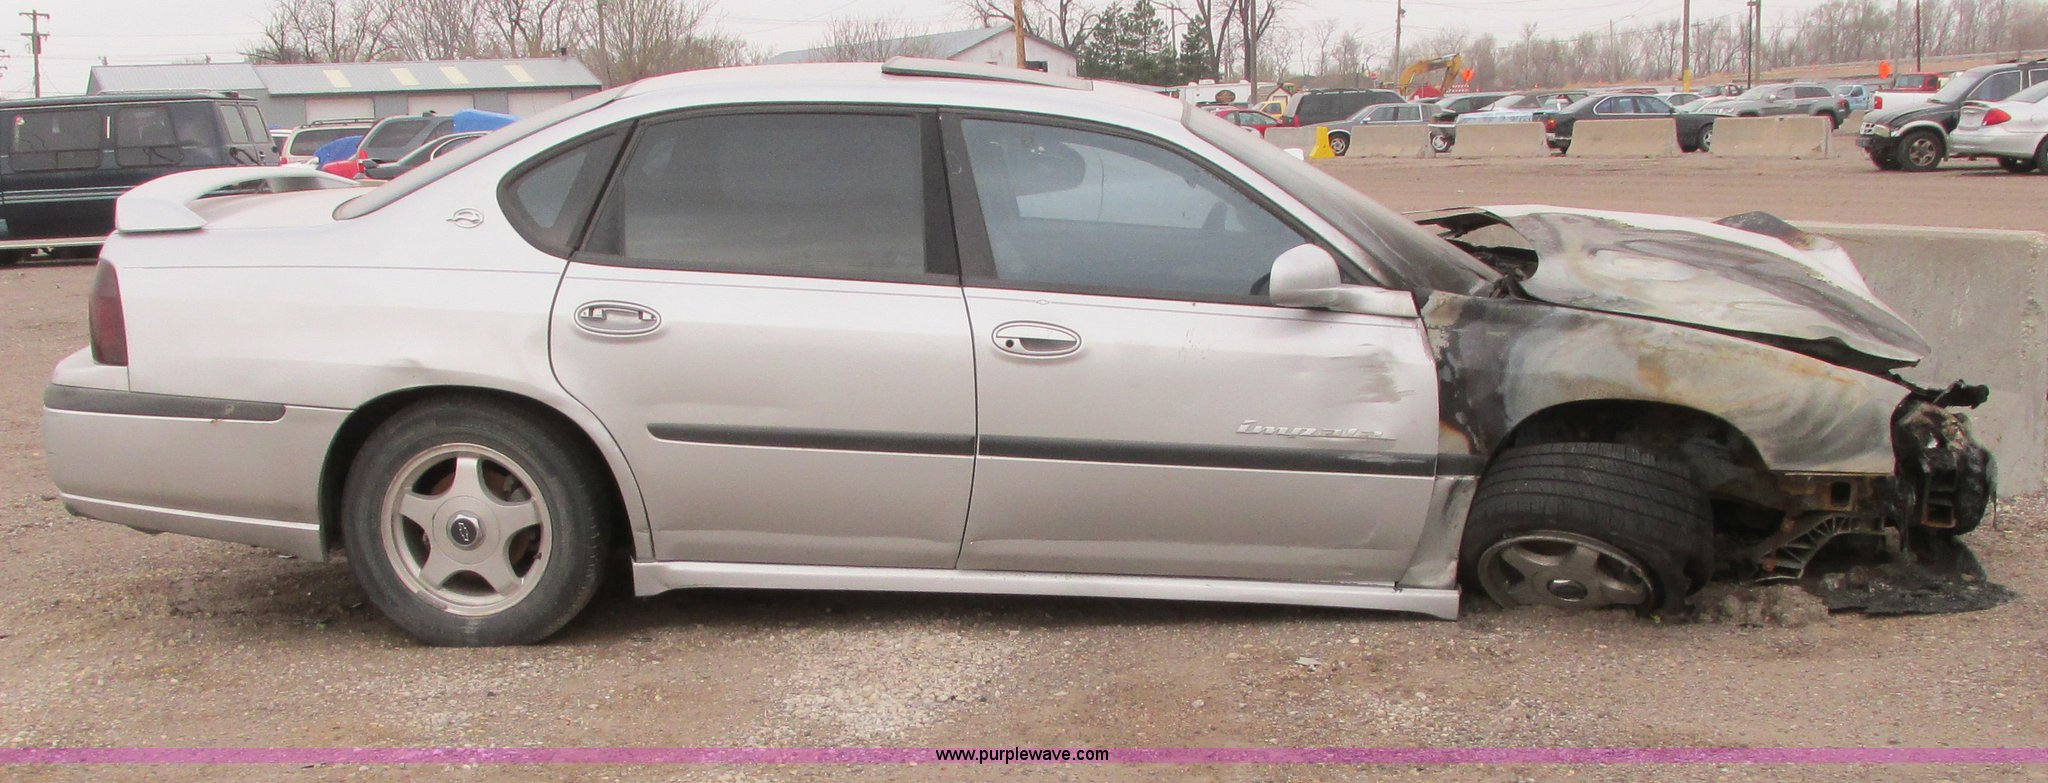 2001 Chevy Impala LS | Item G8493 | SOLD! April 29 City of W...